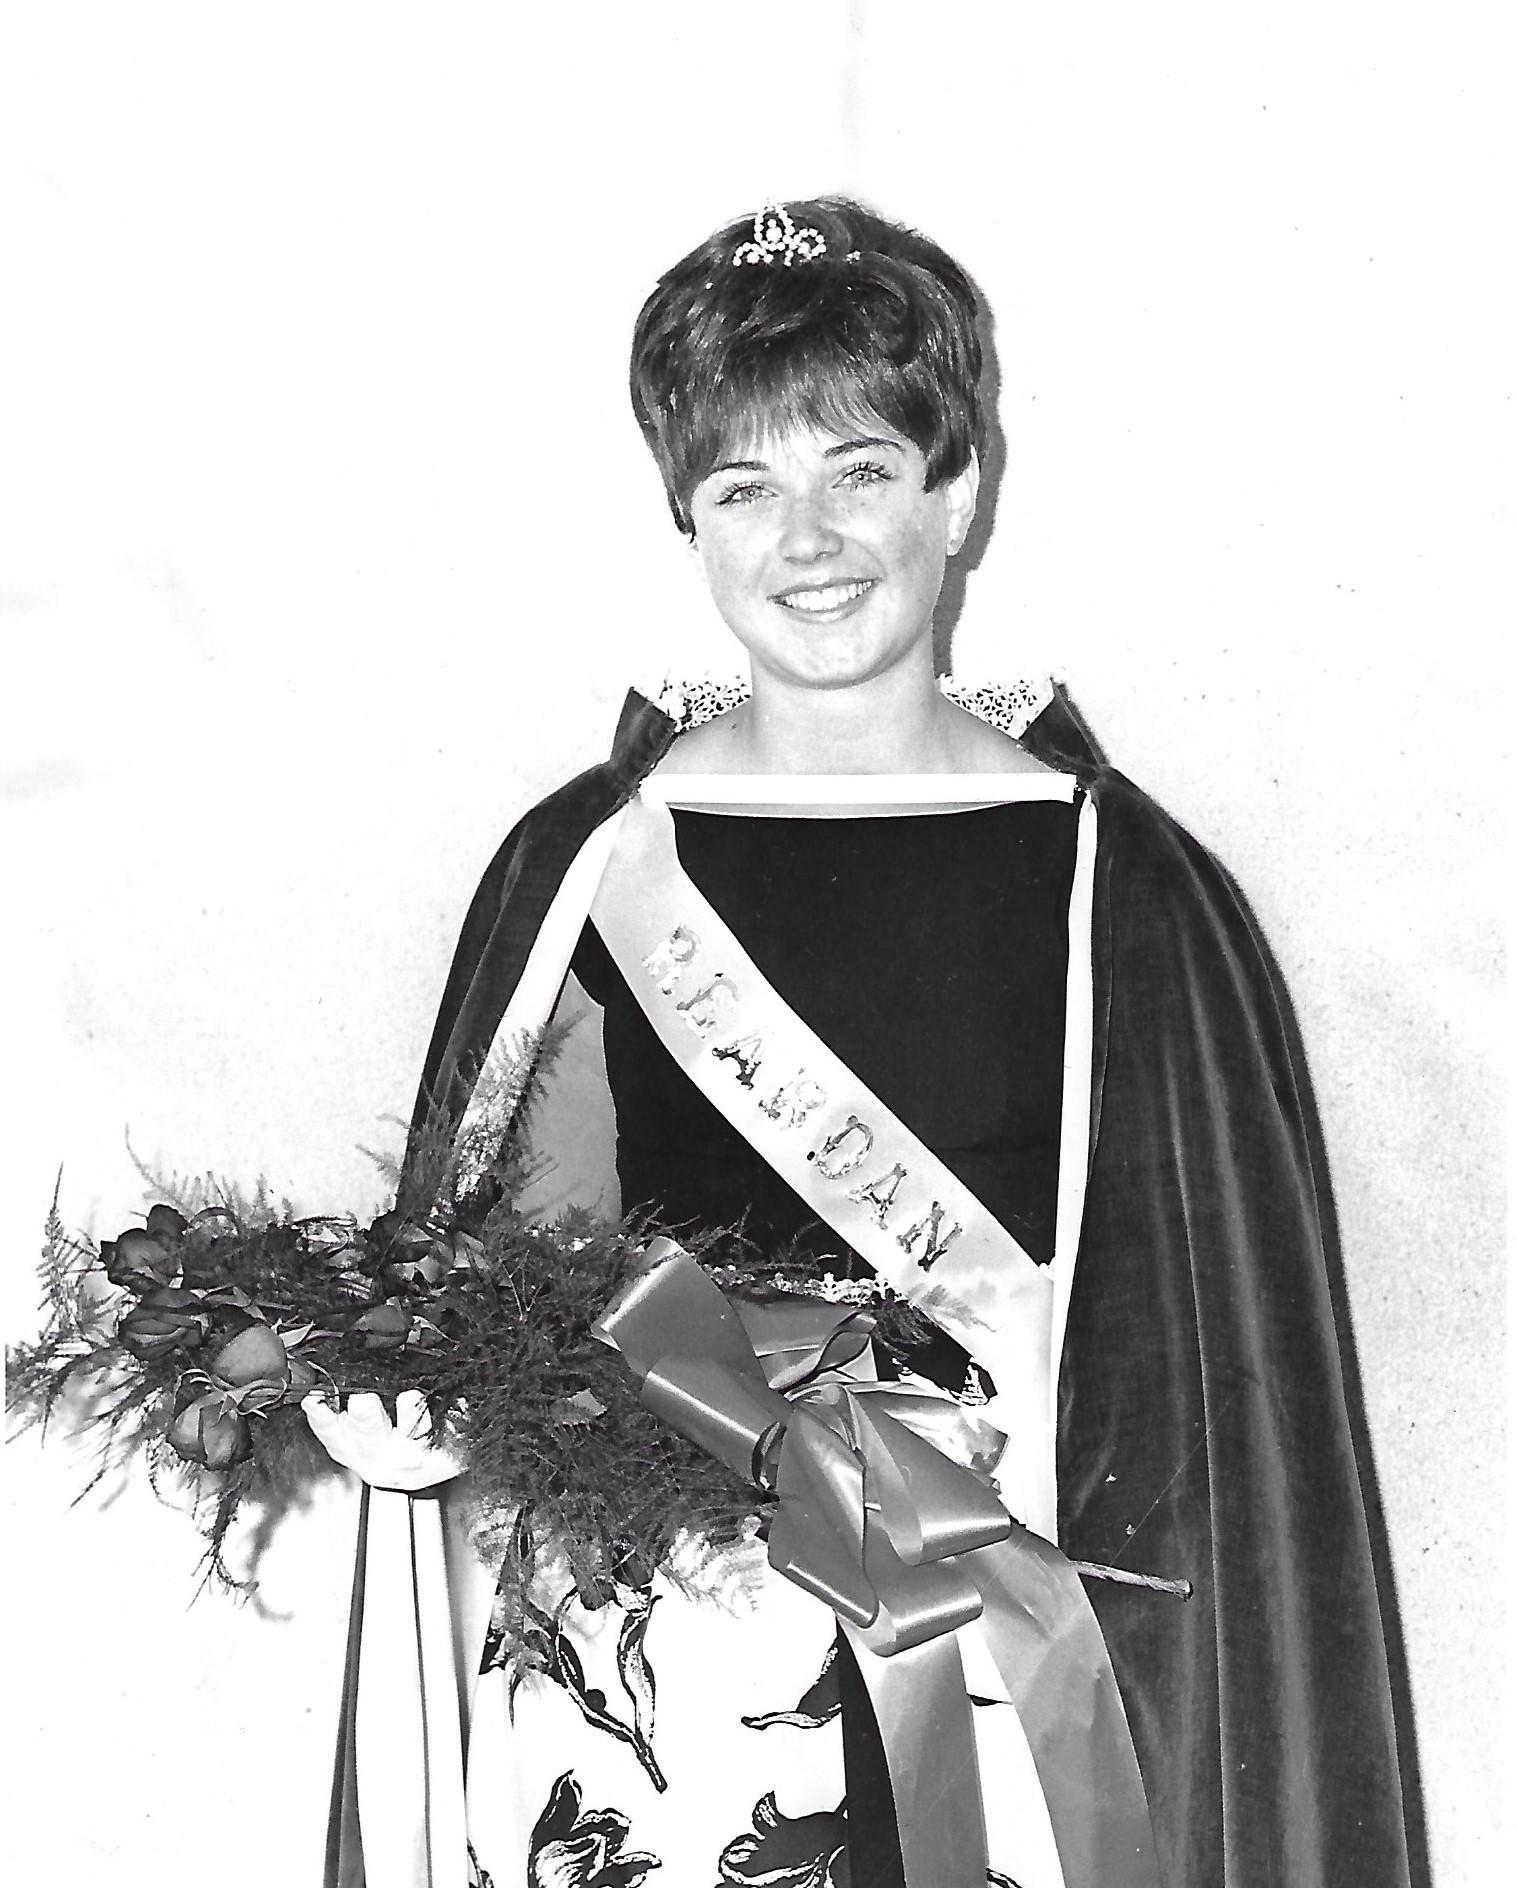 Lincoln County Fair Queen